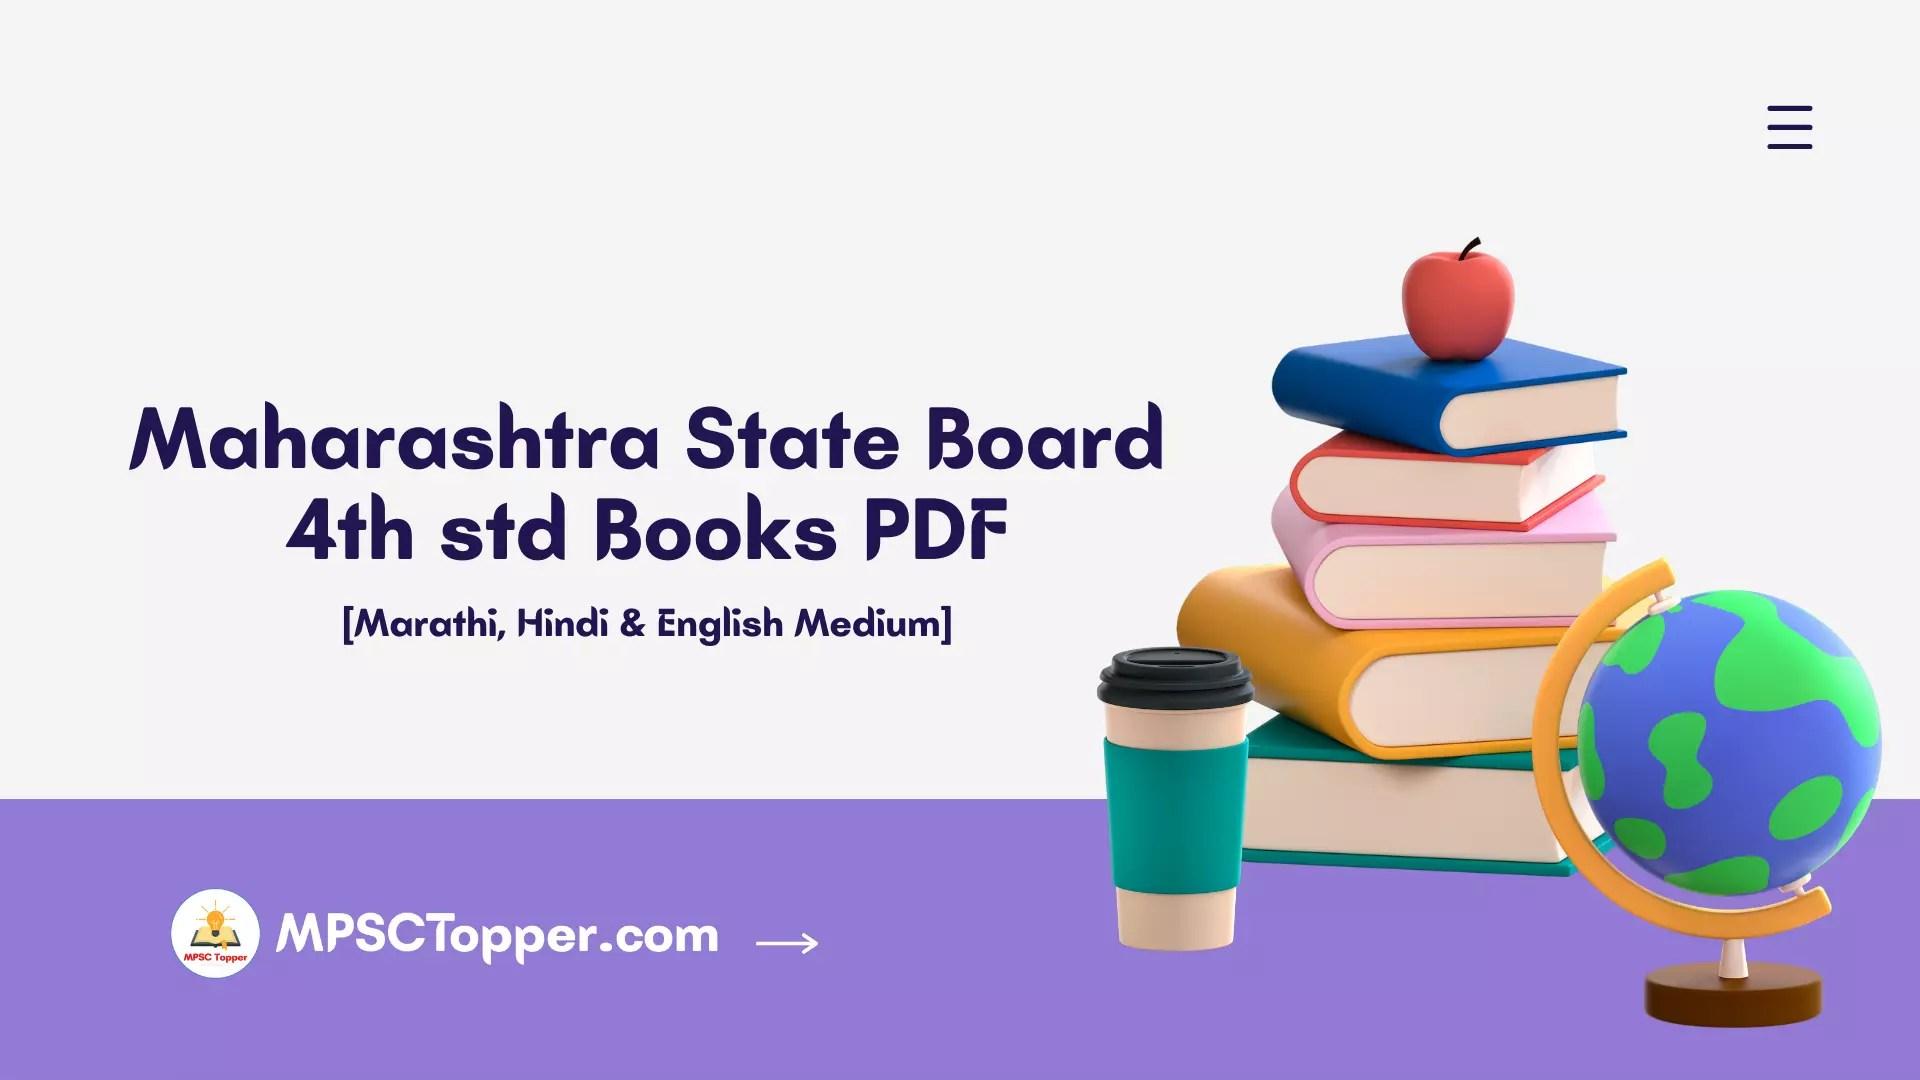 4th std Books PDF